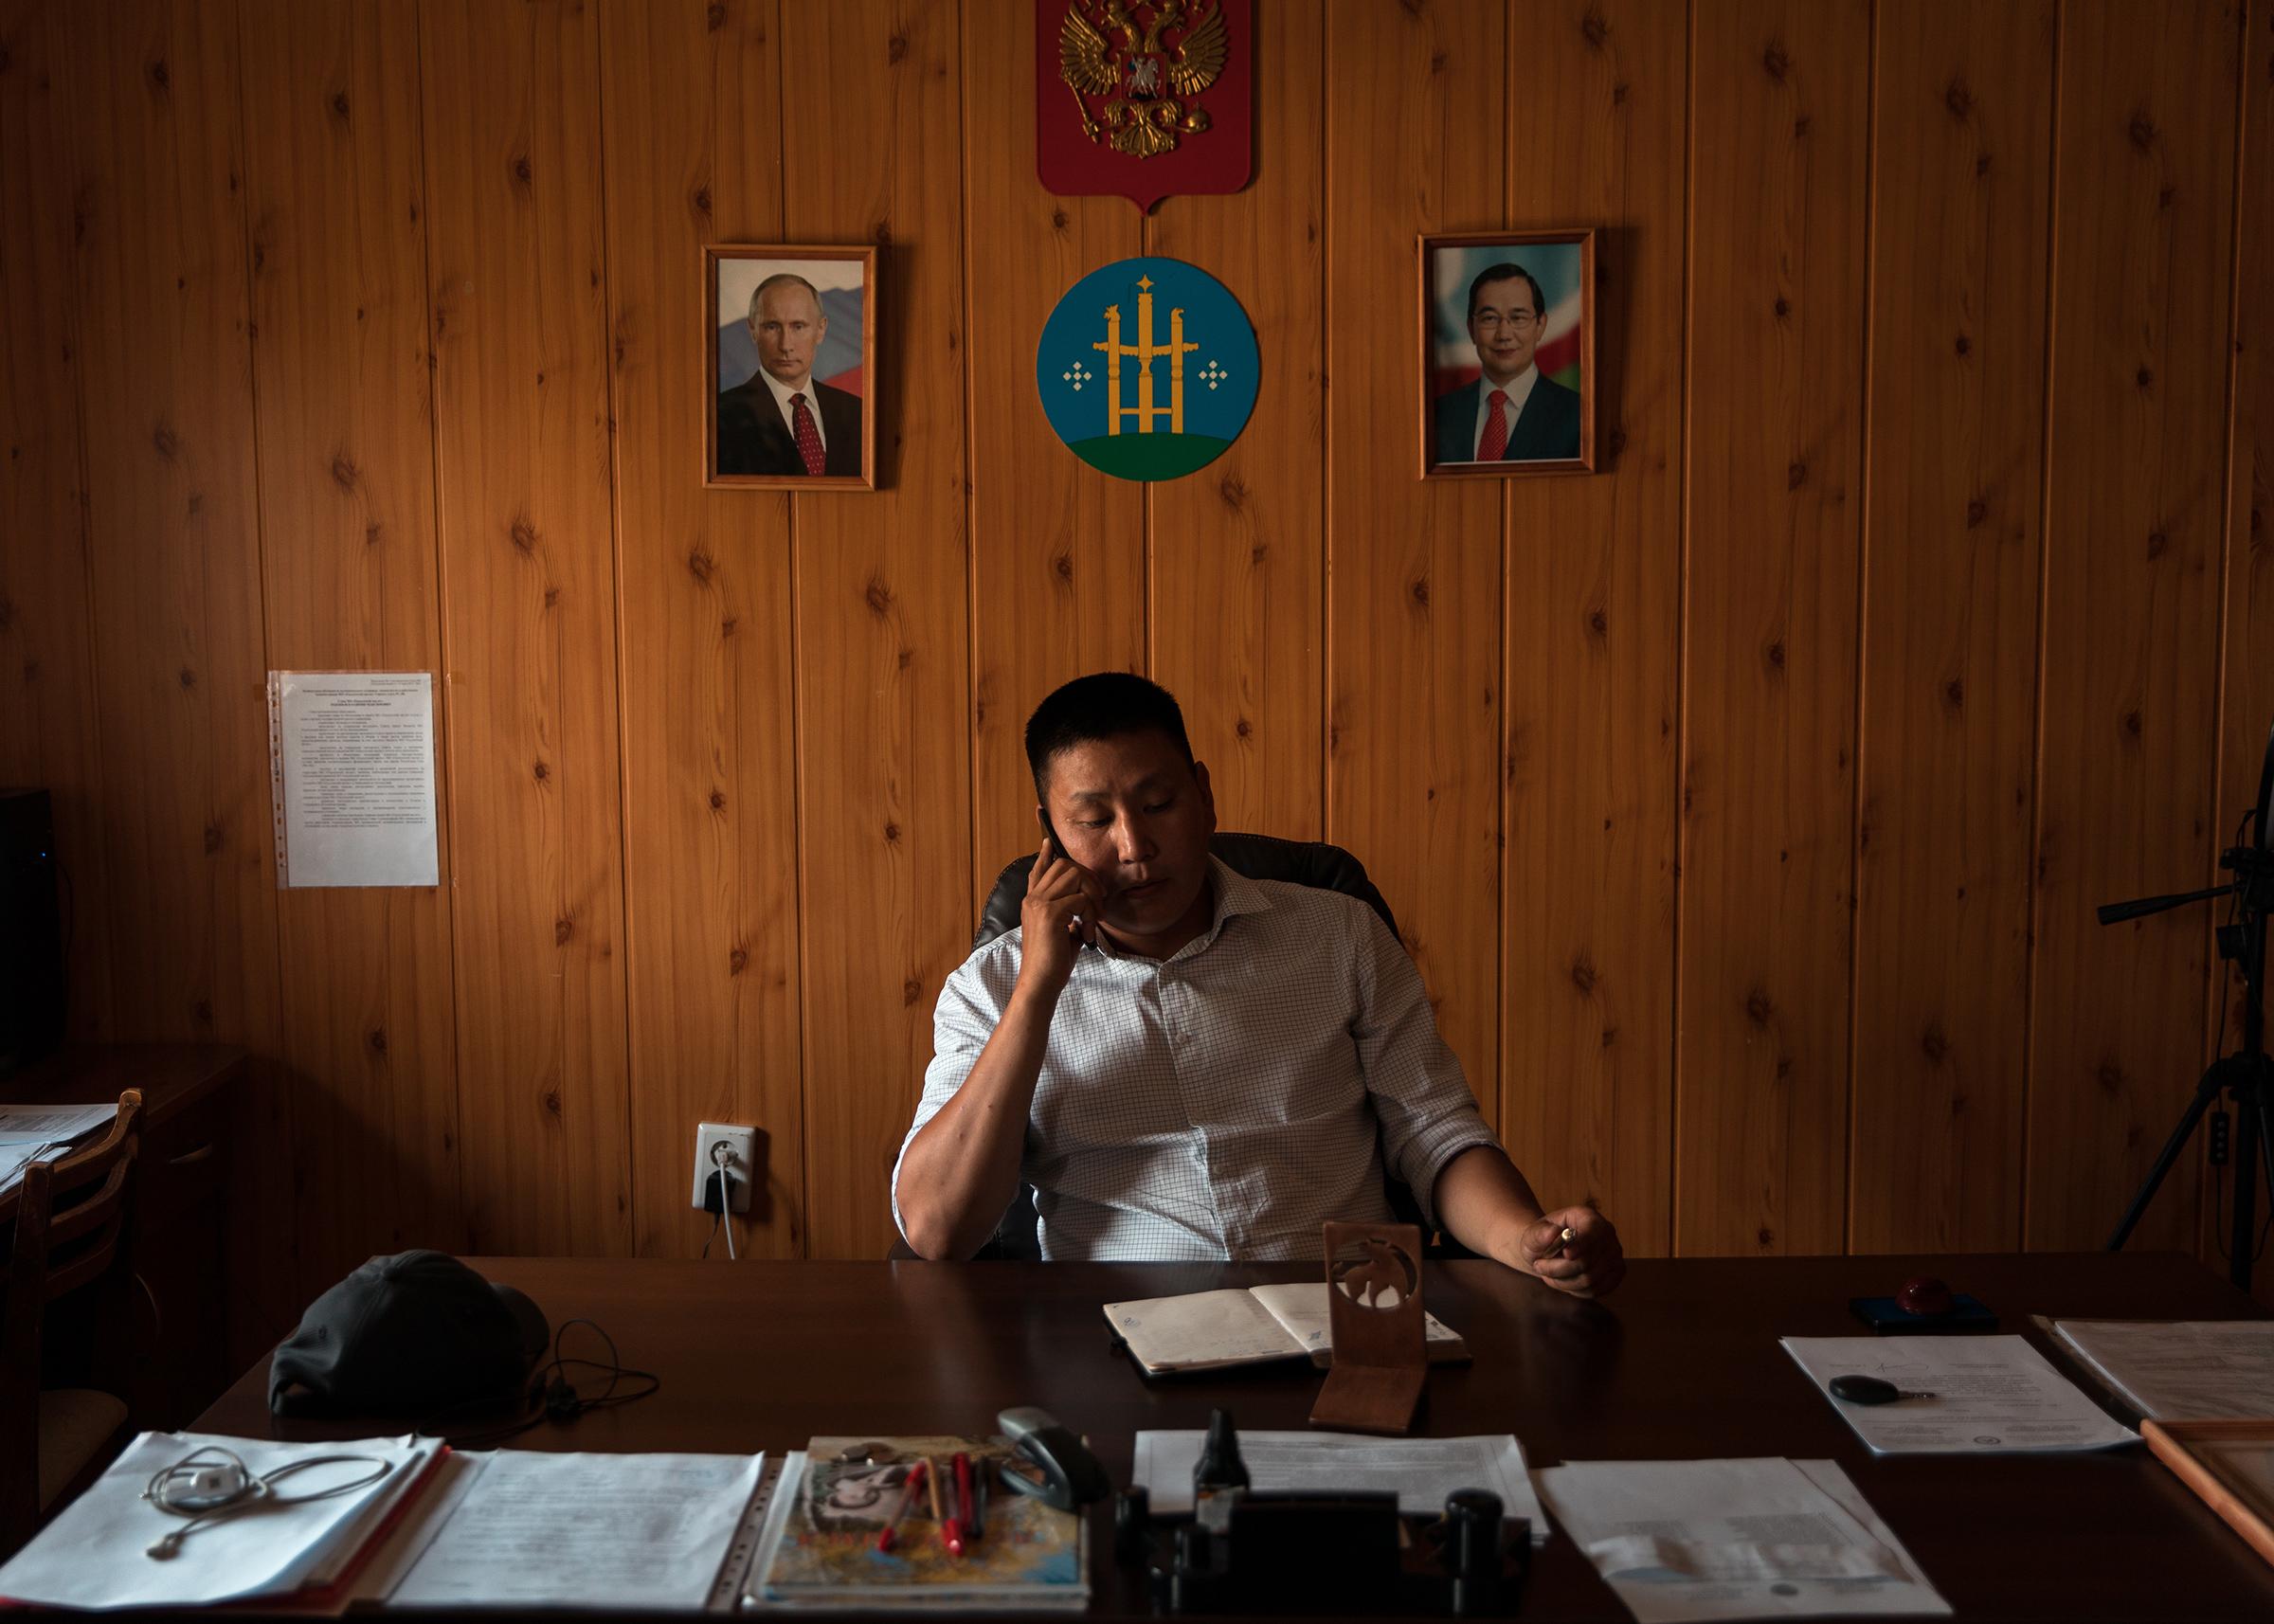 The mayor of Magaras, Vladimir Tekeyanov, in his office.